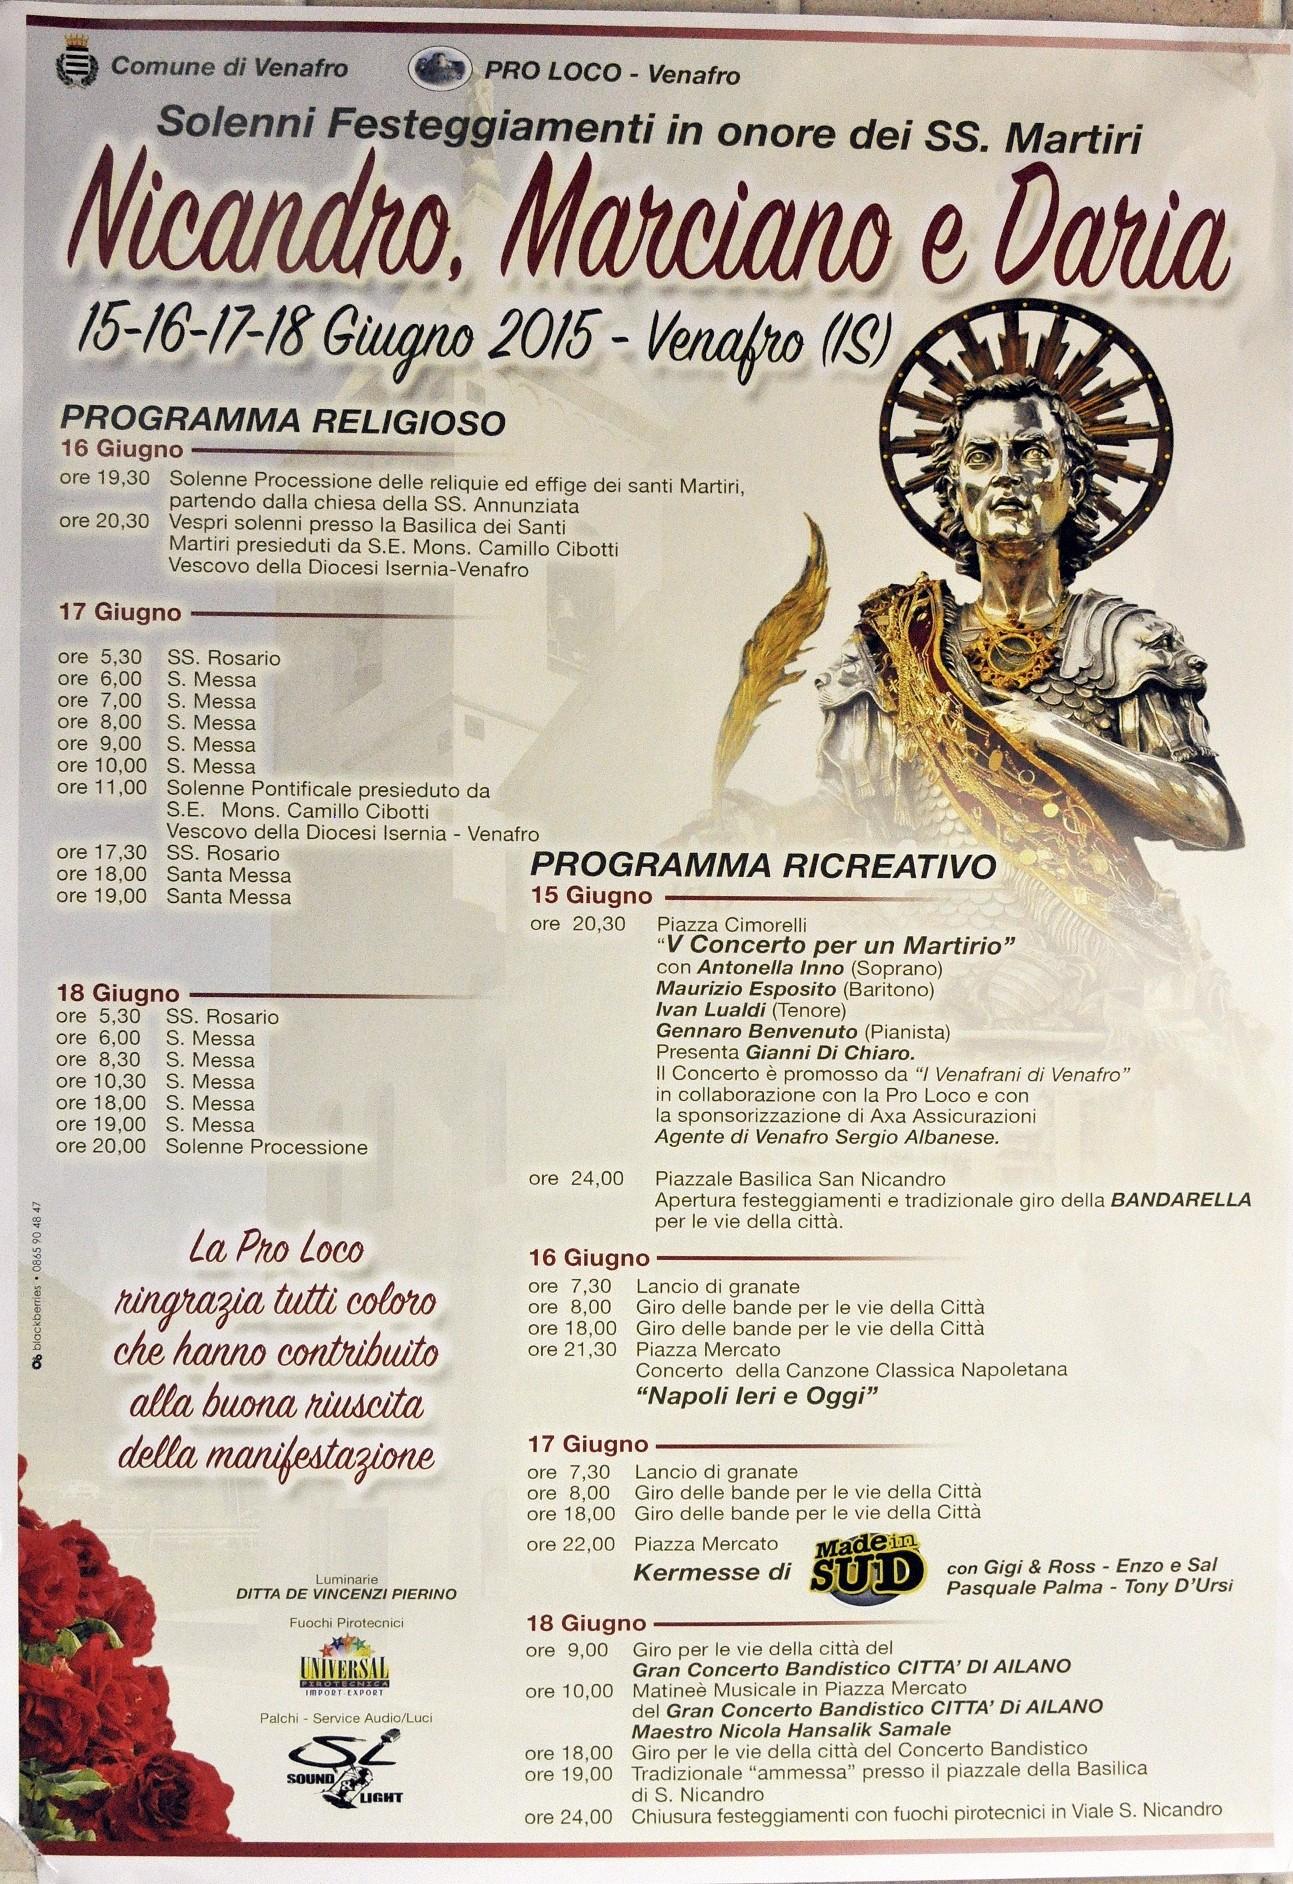 festa san nicandro 2015 programma